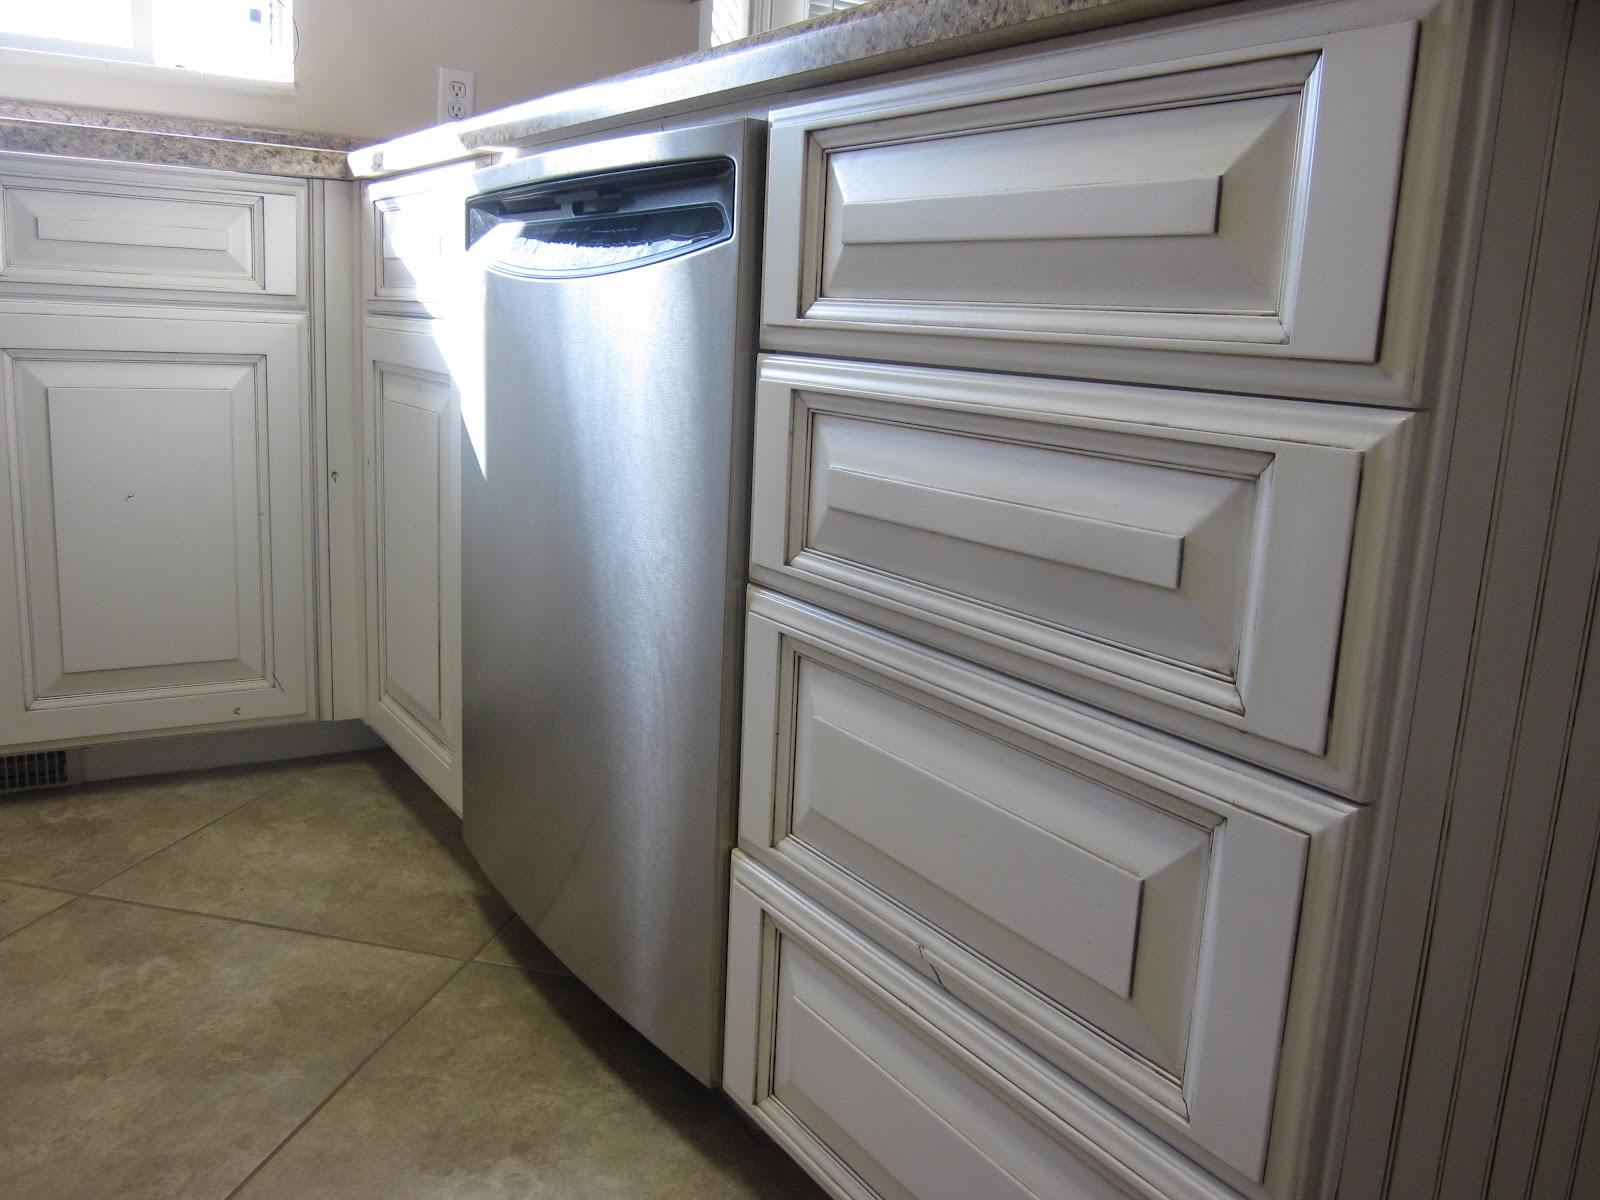 Stone Ridge Cabinets Knotty Alder Kitchen Before And